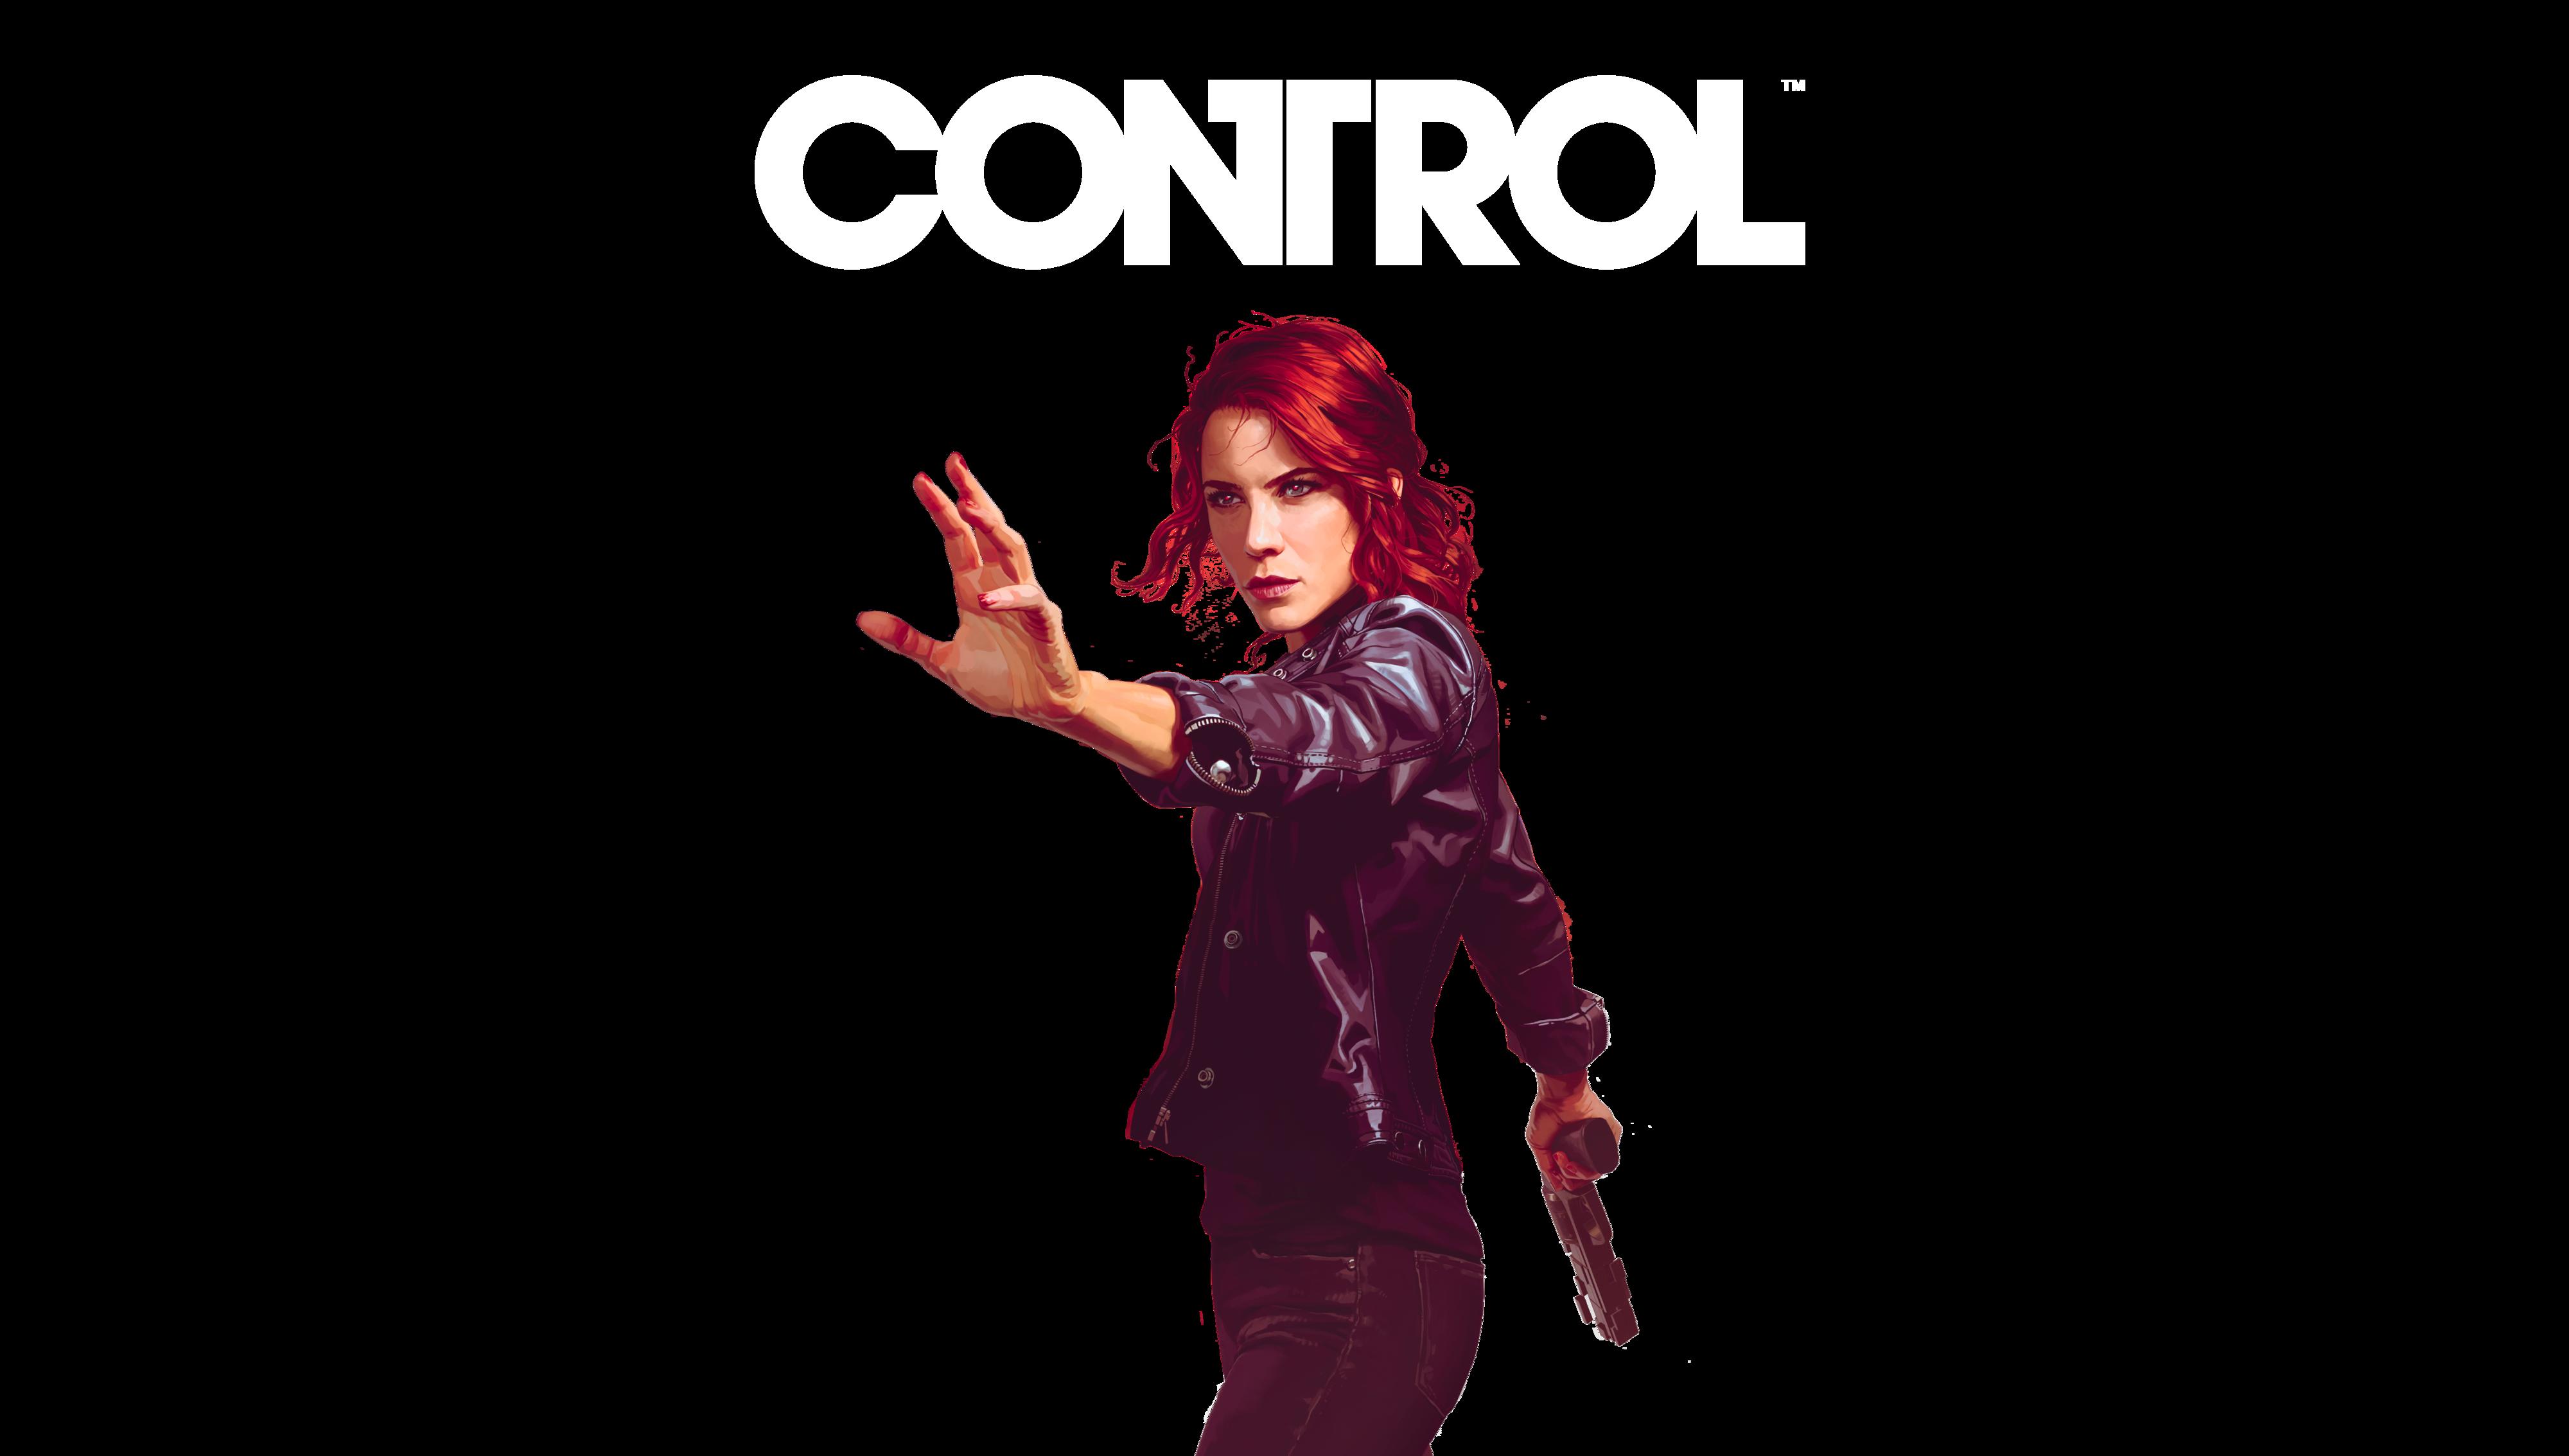 CONTROL keyart wide FINALx